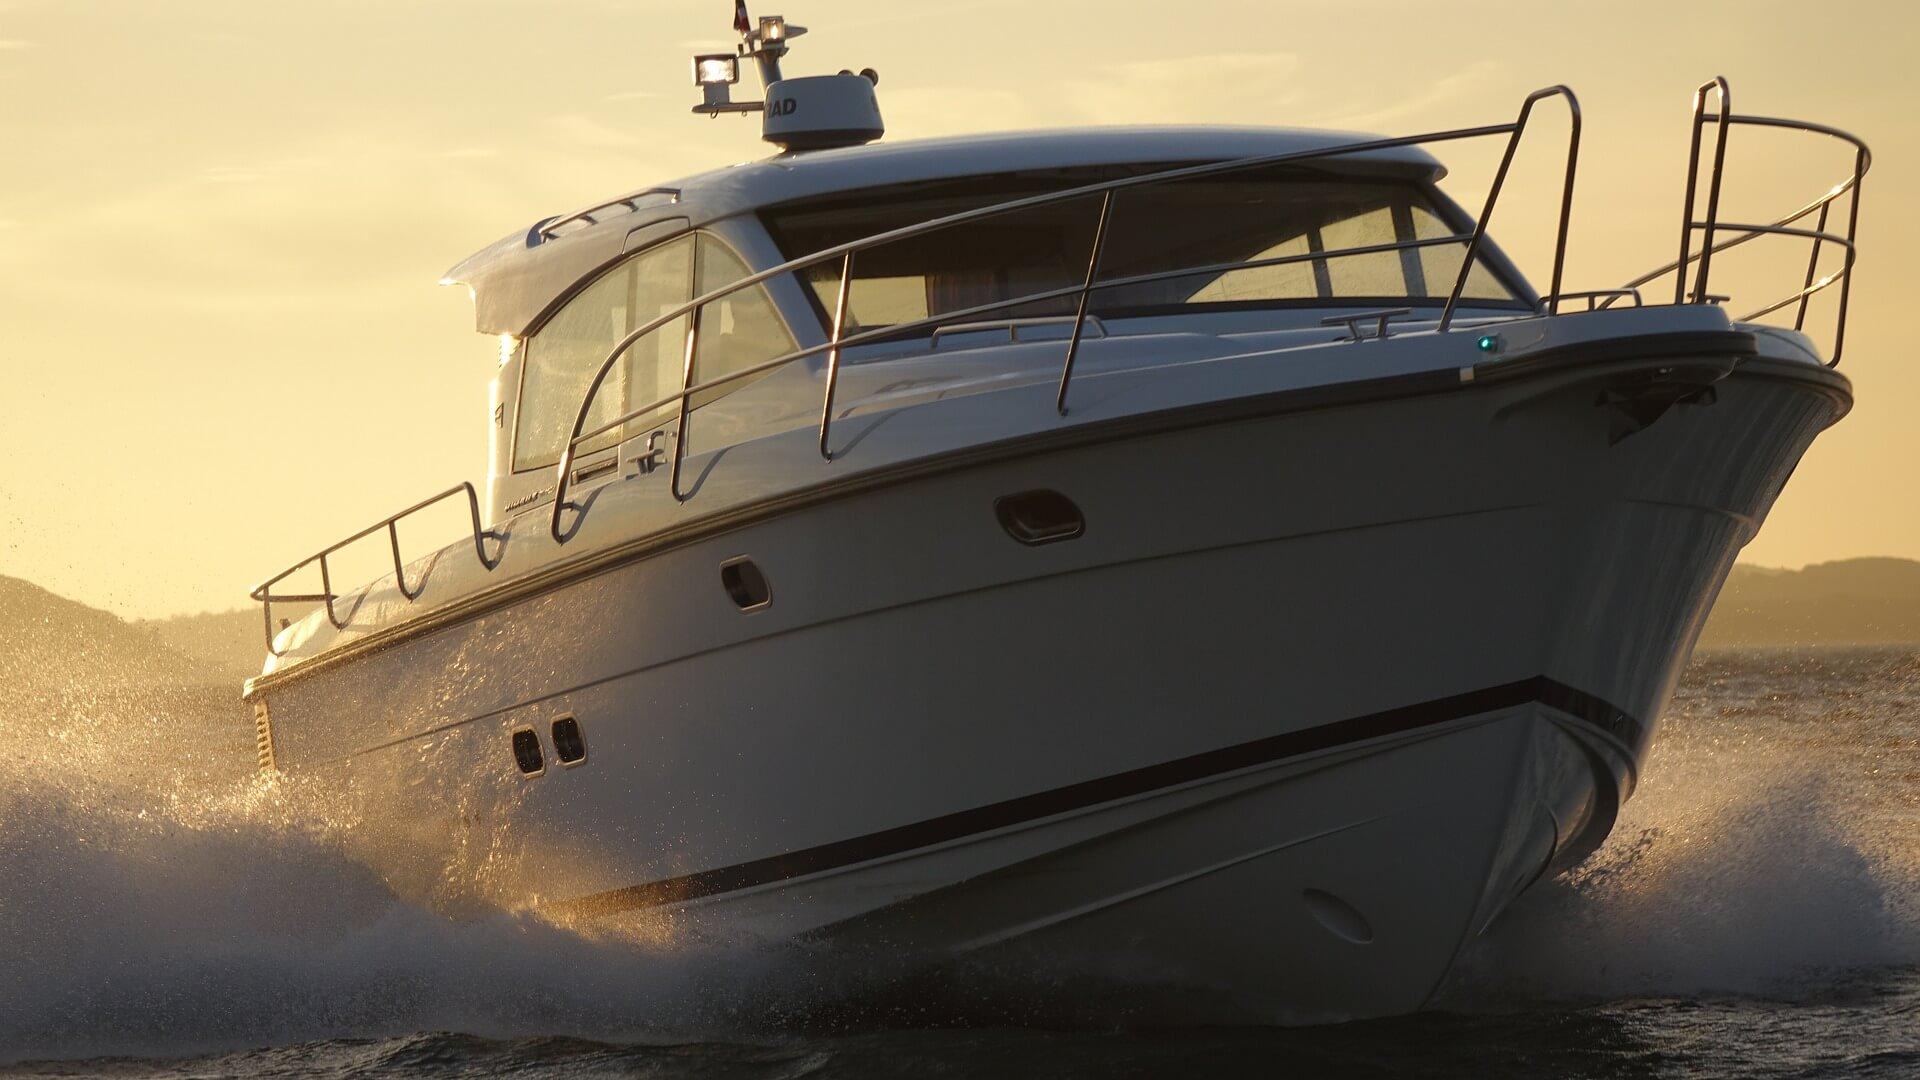 motor-yacht-634925_1920(1)